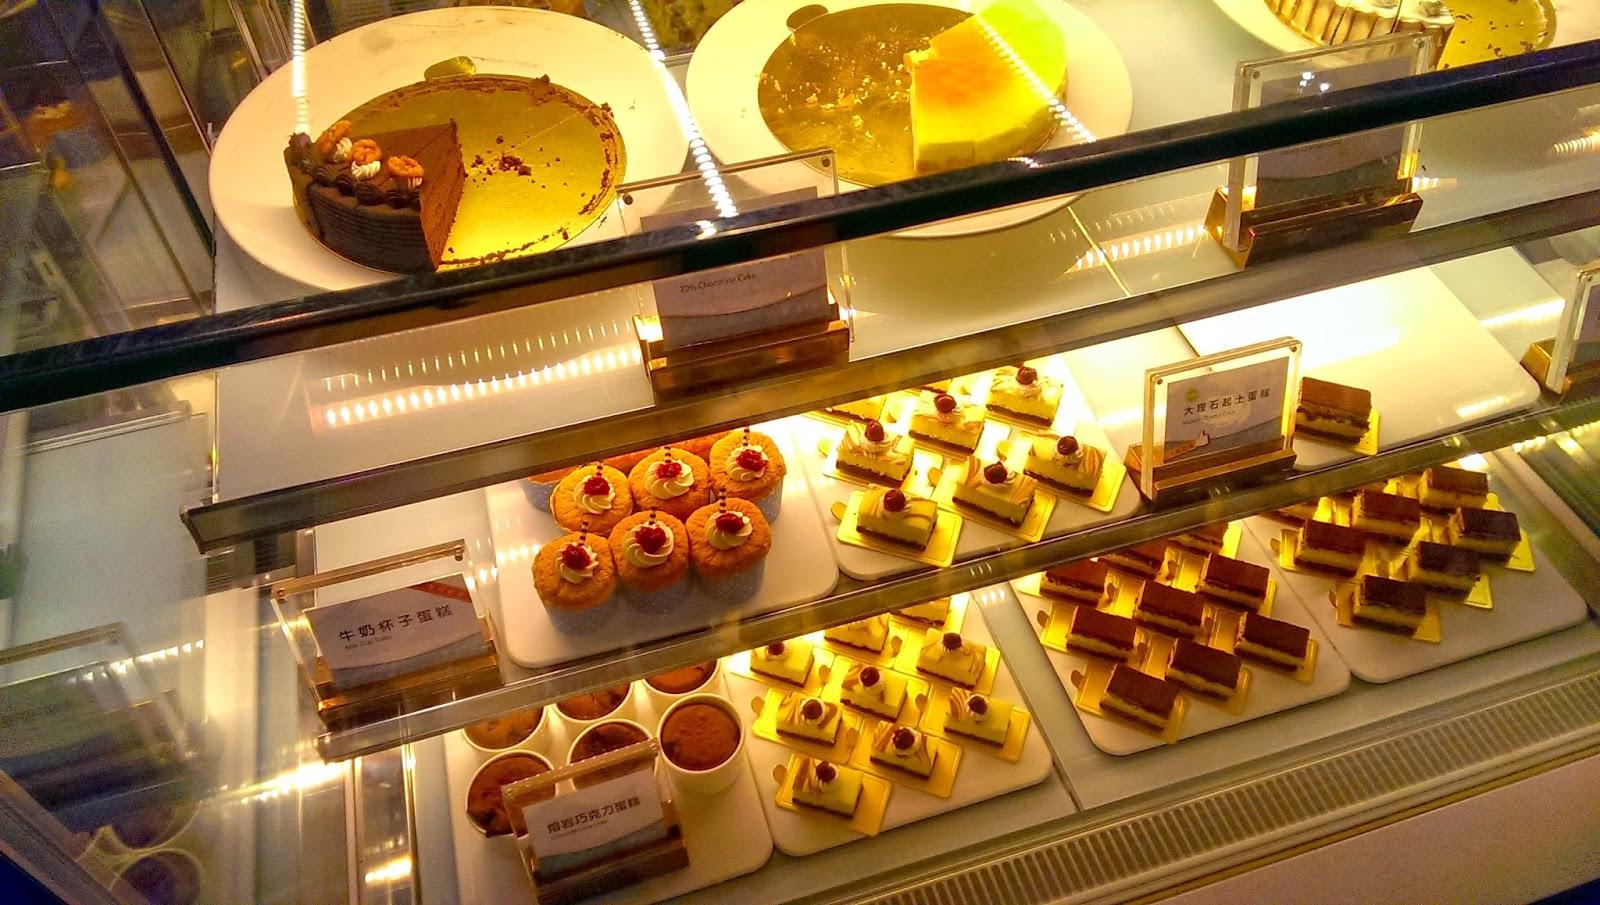 2015 07 01%2B18.57.01 - [食記] 台北京站 - 饗食天堂,有生魚片吃到飽的高級自助餐廳!